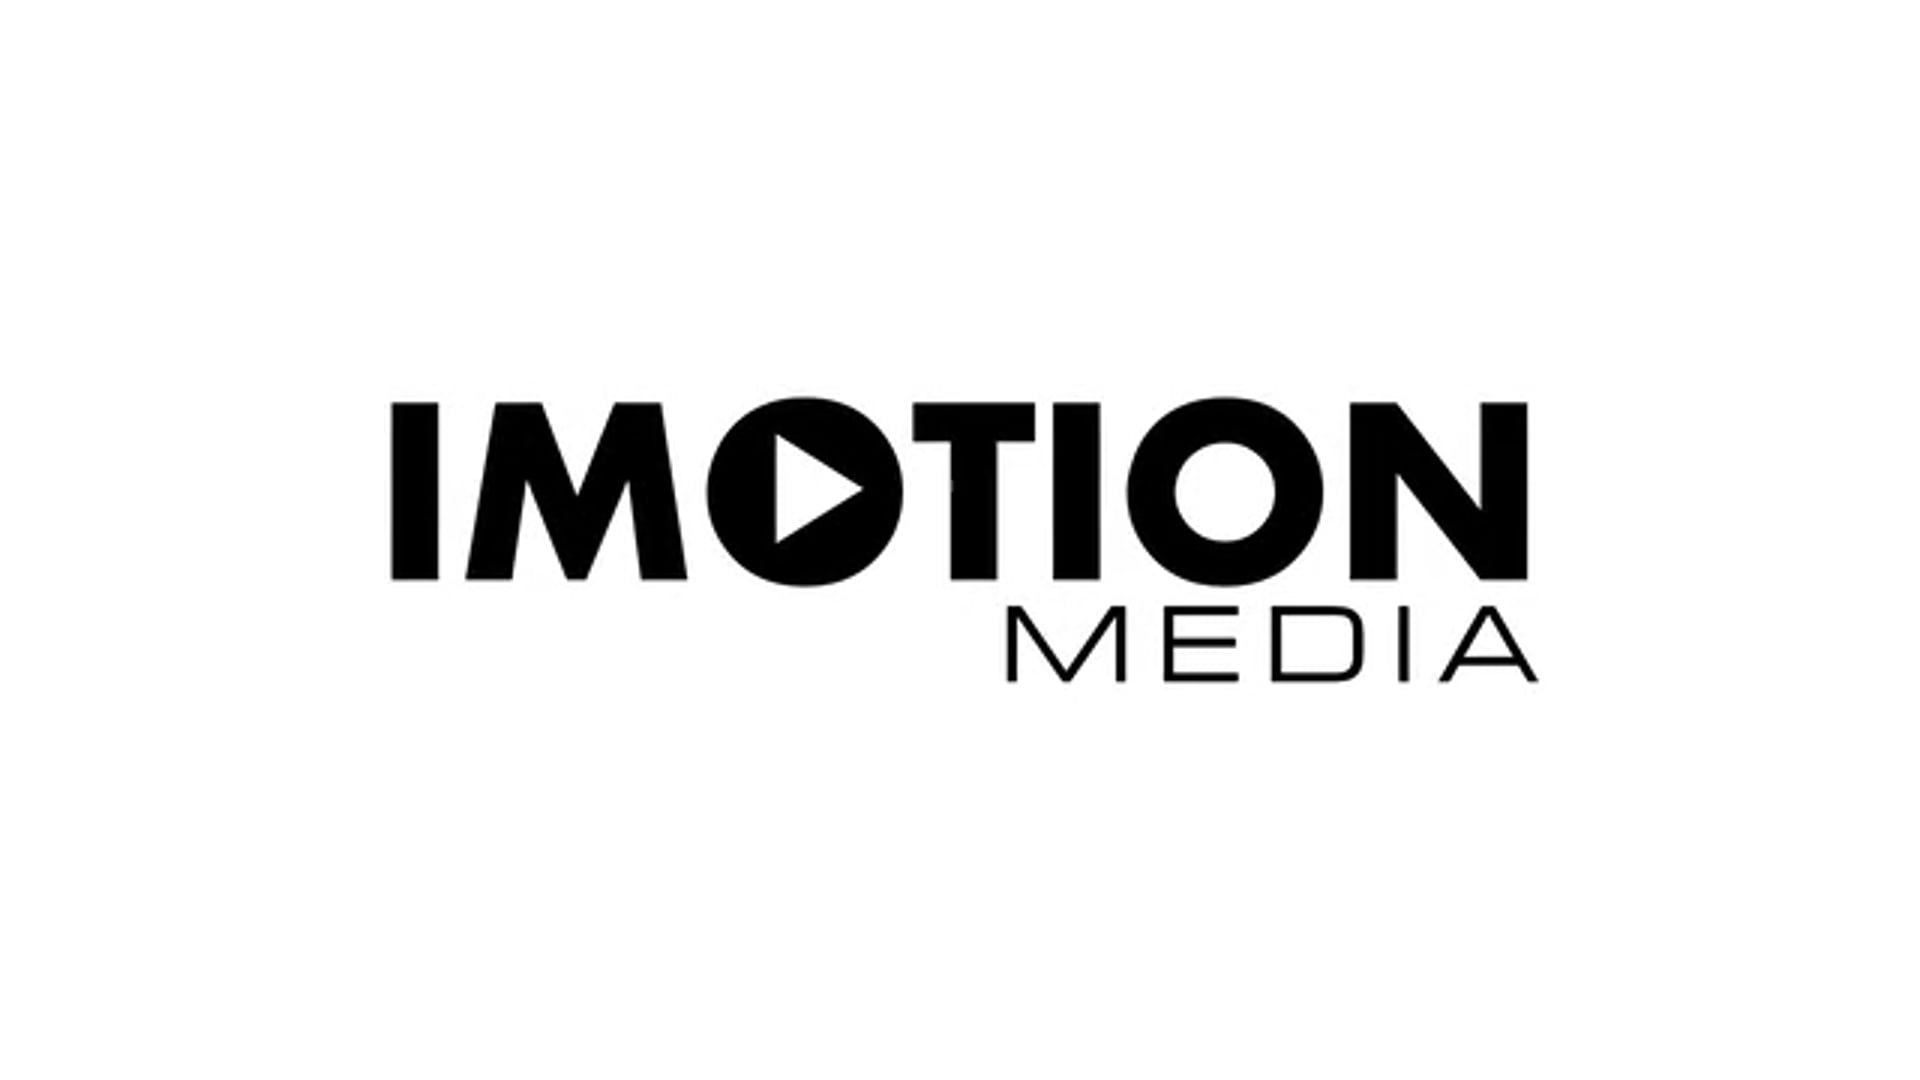 Imotion Media Showreel 2020